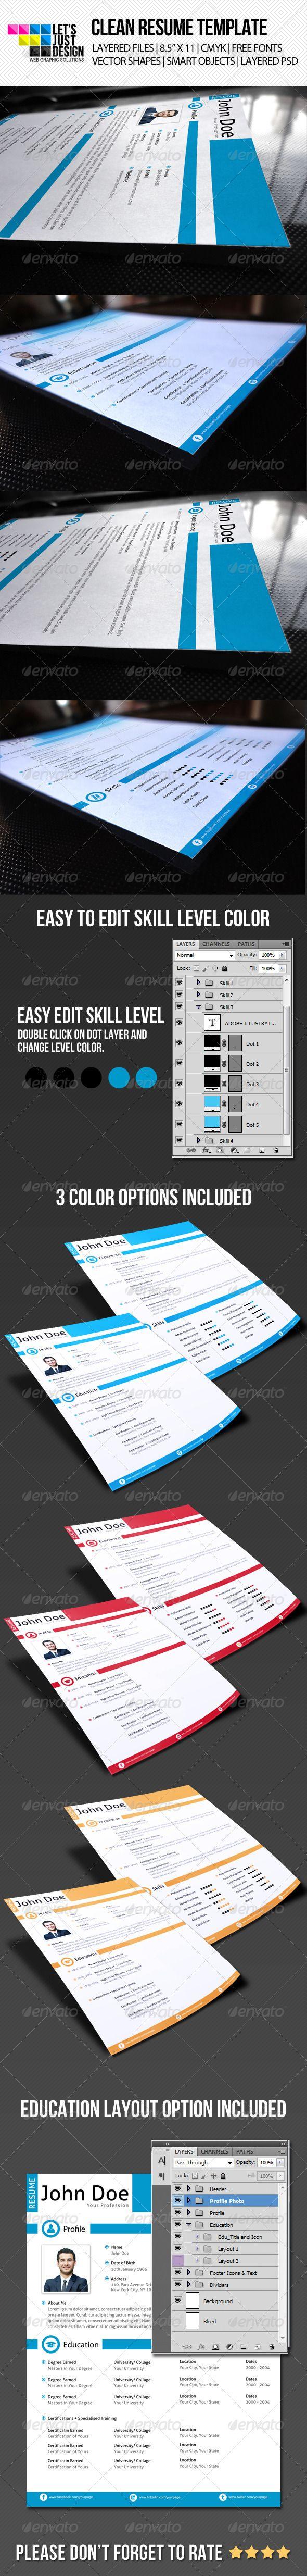 1749 best Minimal Resume images on Pinterest | Print templates ...